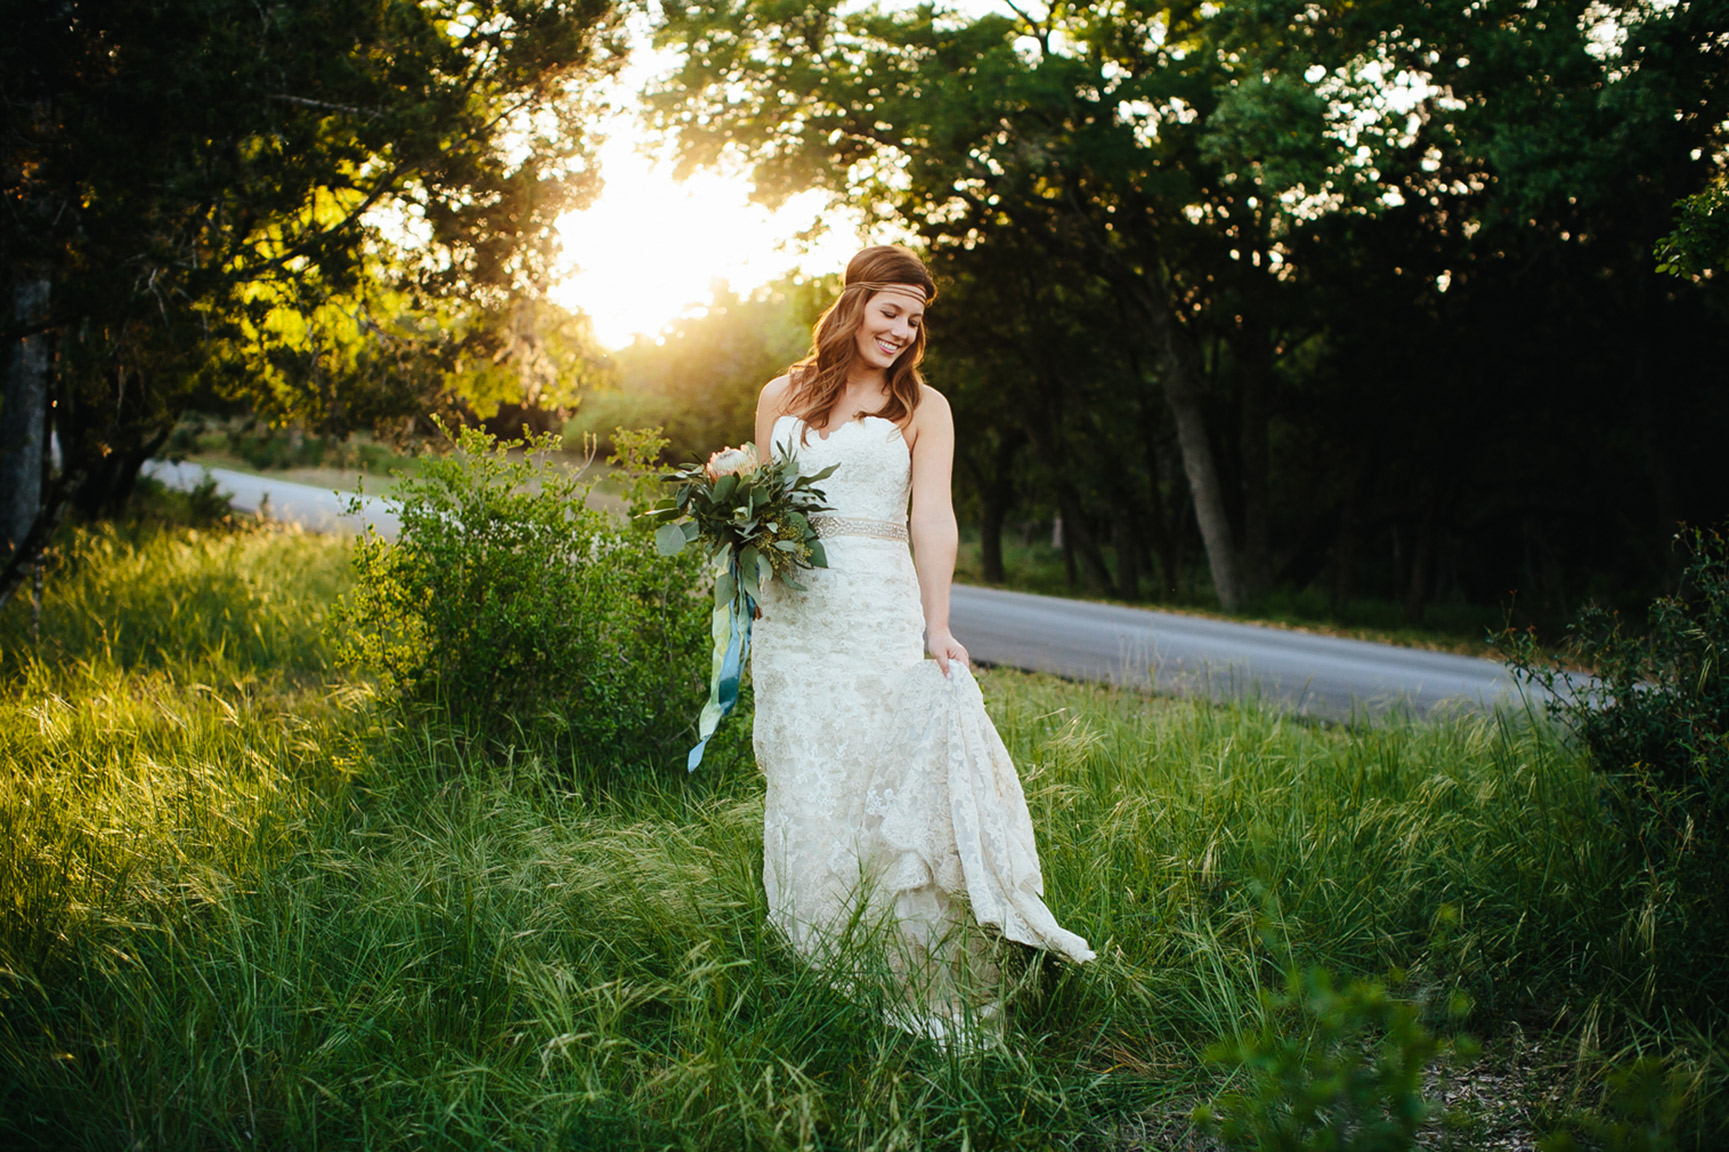 Austin_BRIDAL_WeddingPhotographer009.jpg